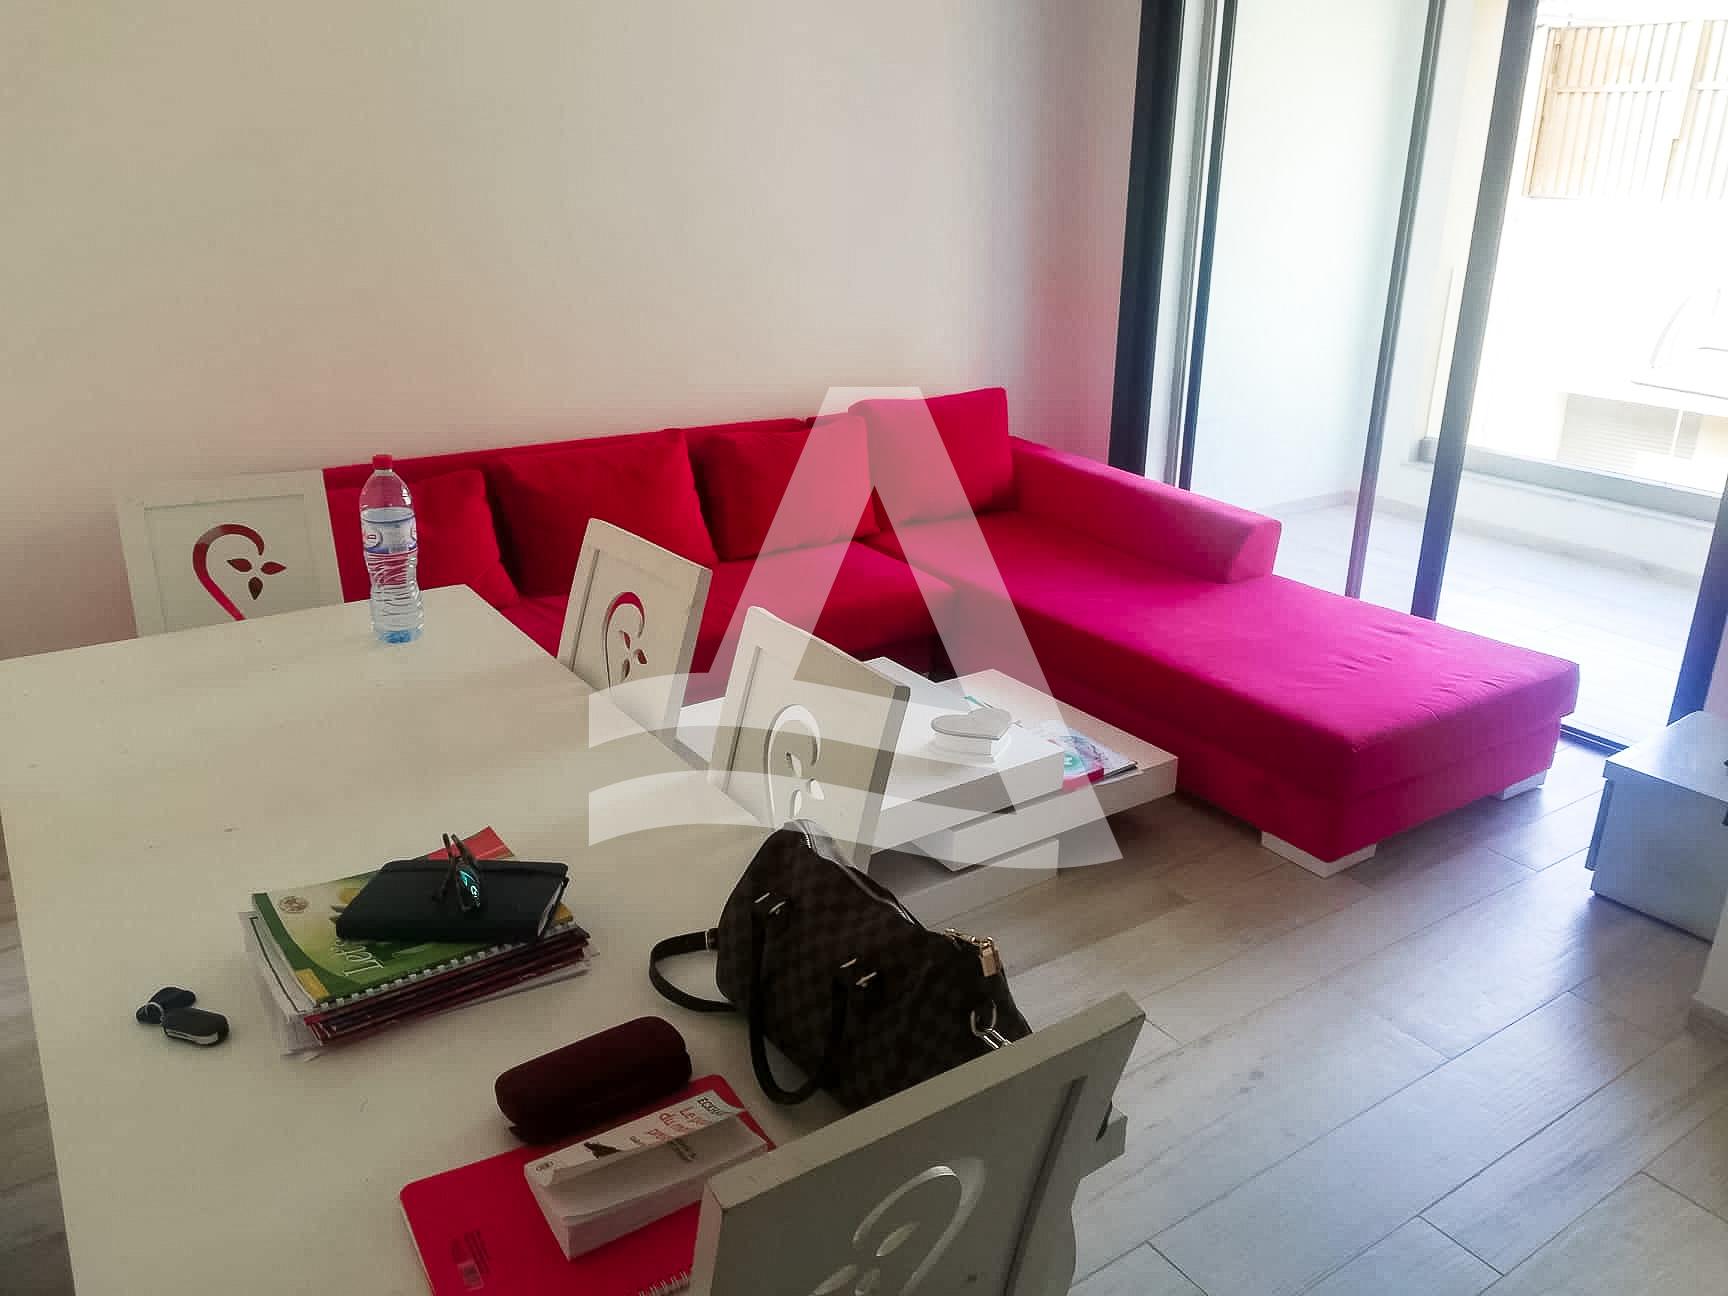 httpss3.amazonaws.comlogimoawsImmobilier_La_marsa_-_arcane_immobiliere-7_1554216056712